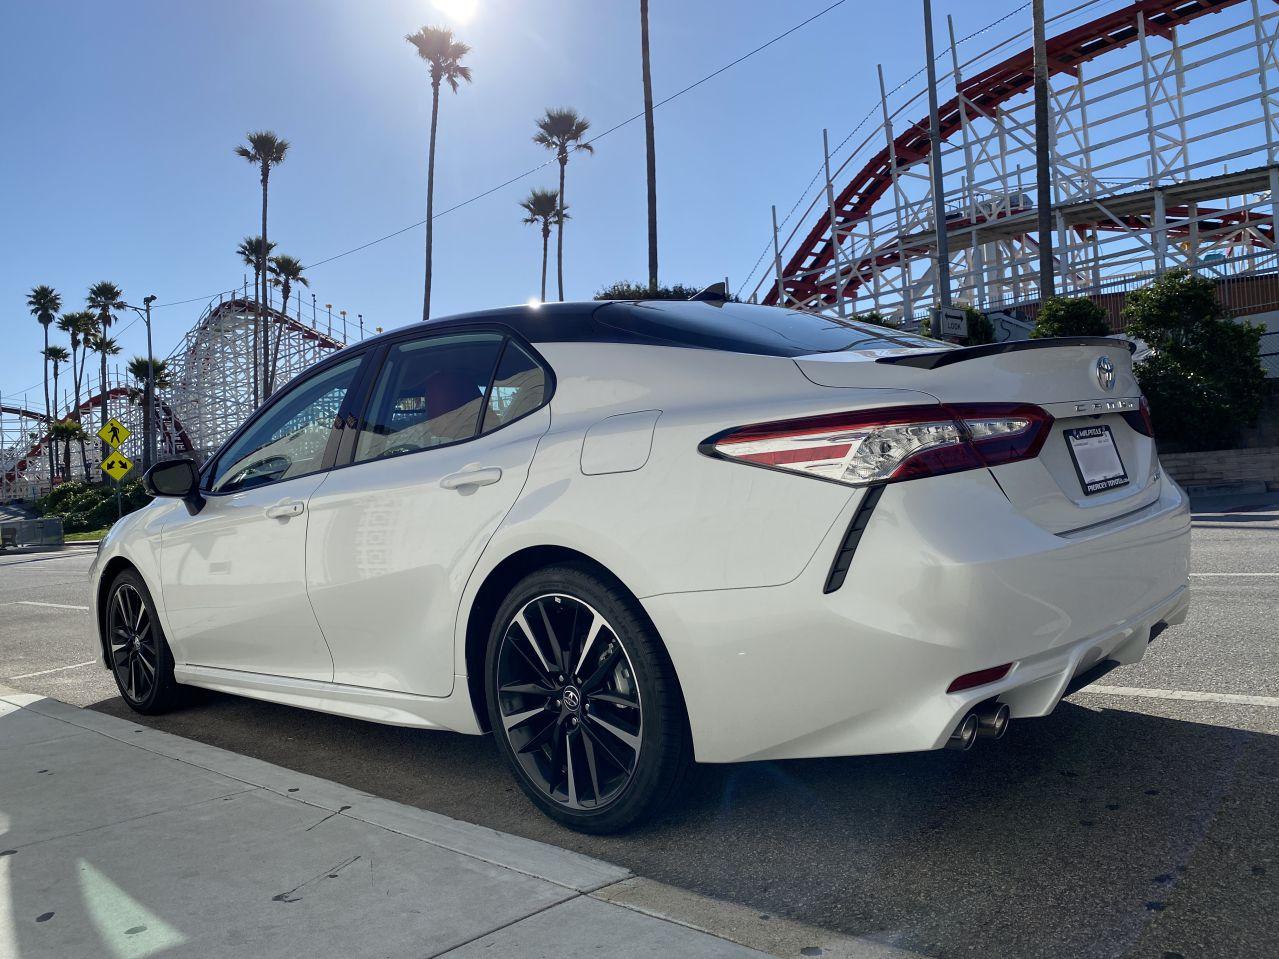 Toyota Camry XSE at Santa Cruz